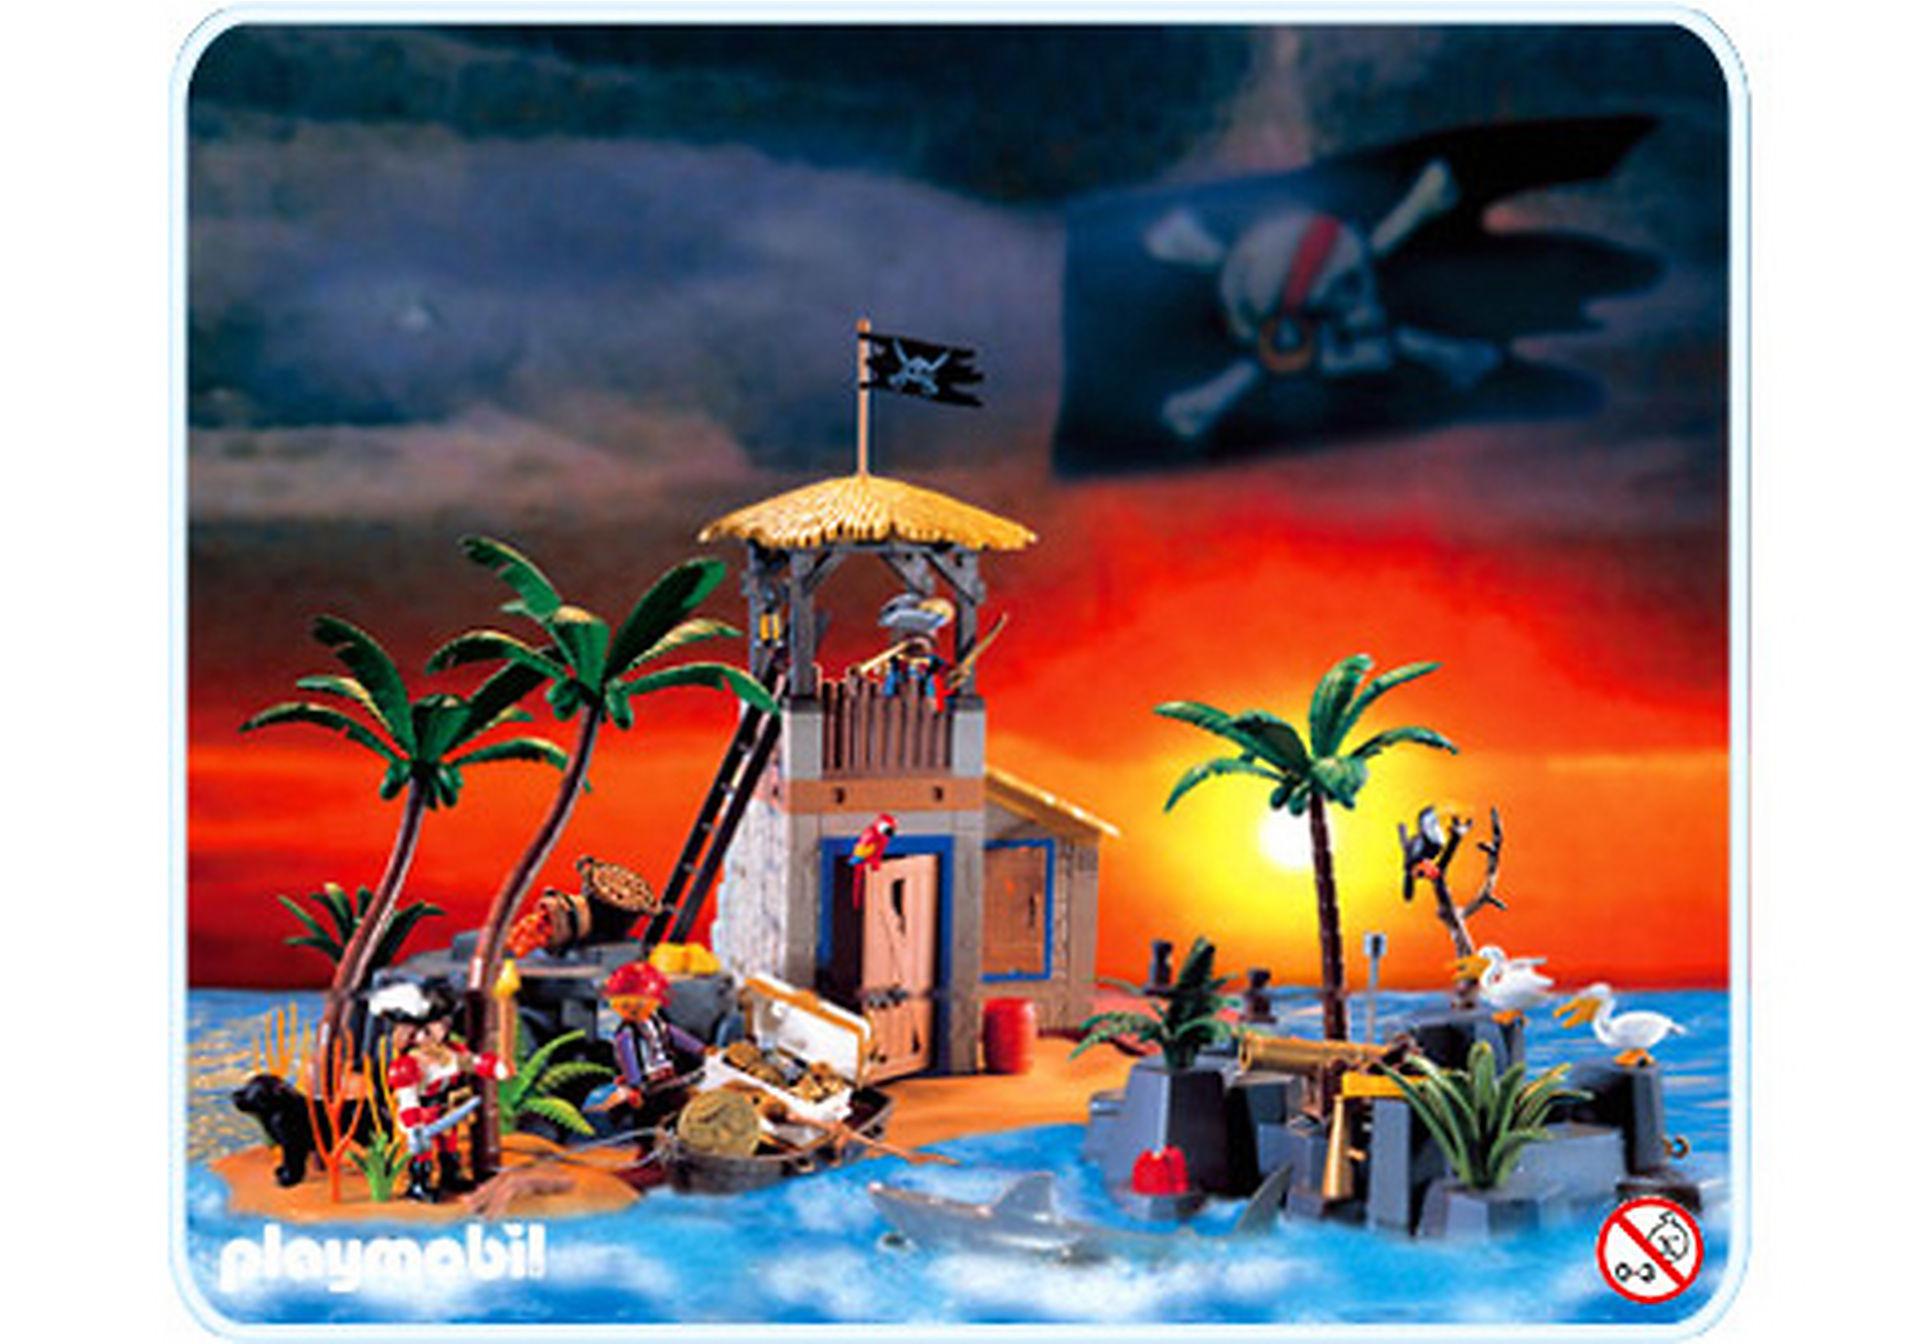 3938-A Repaire des pirates zoom image1